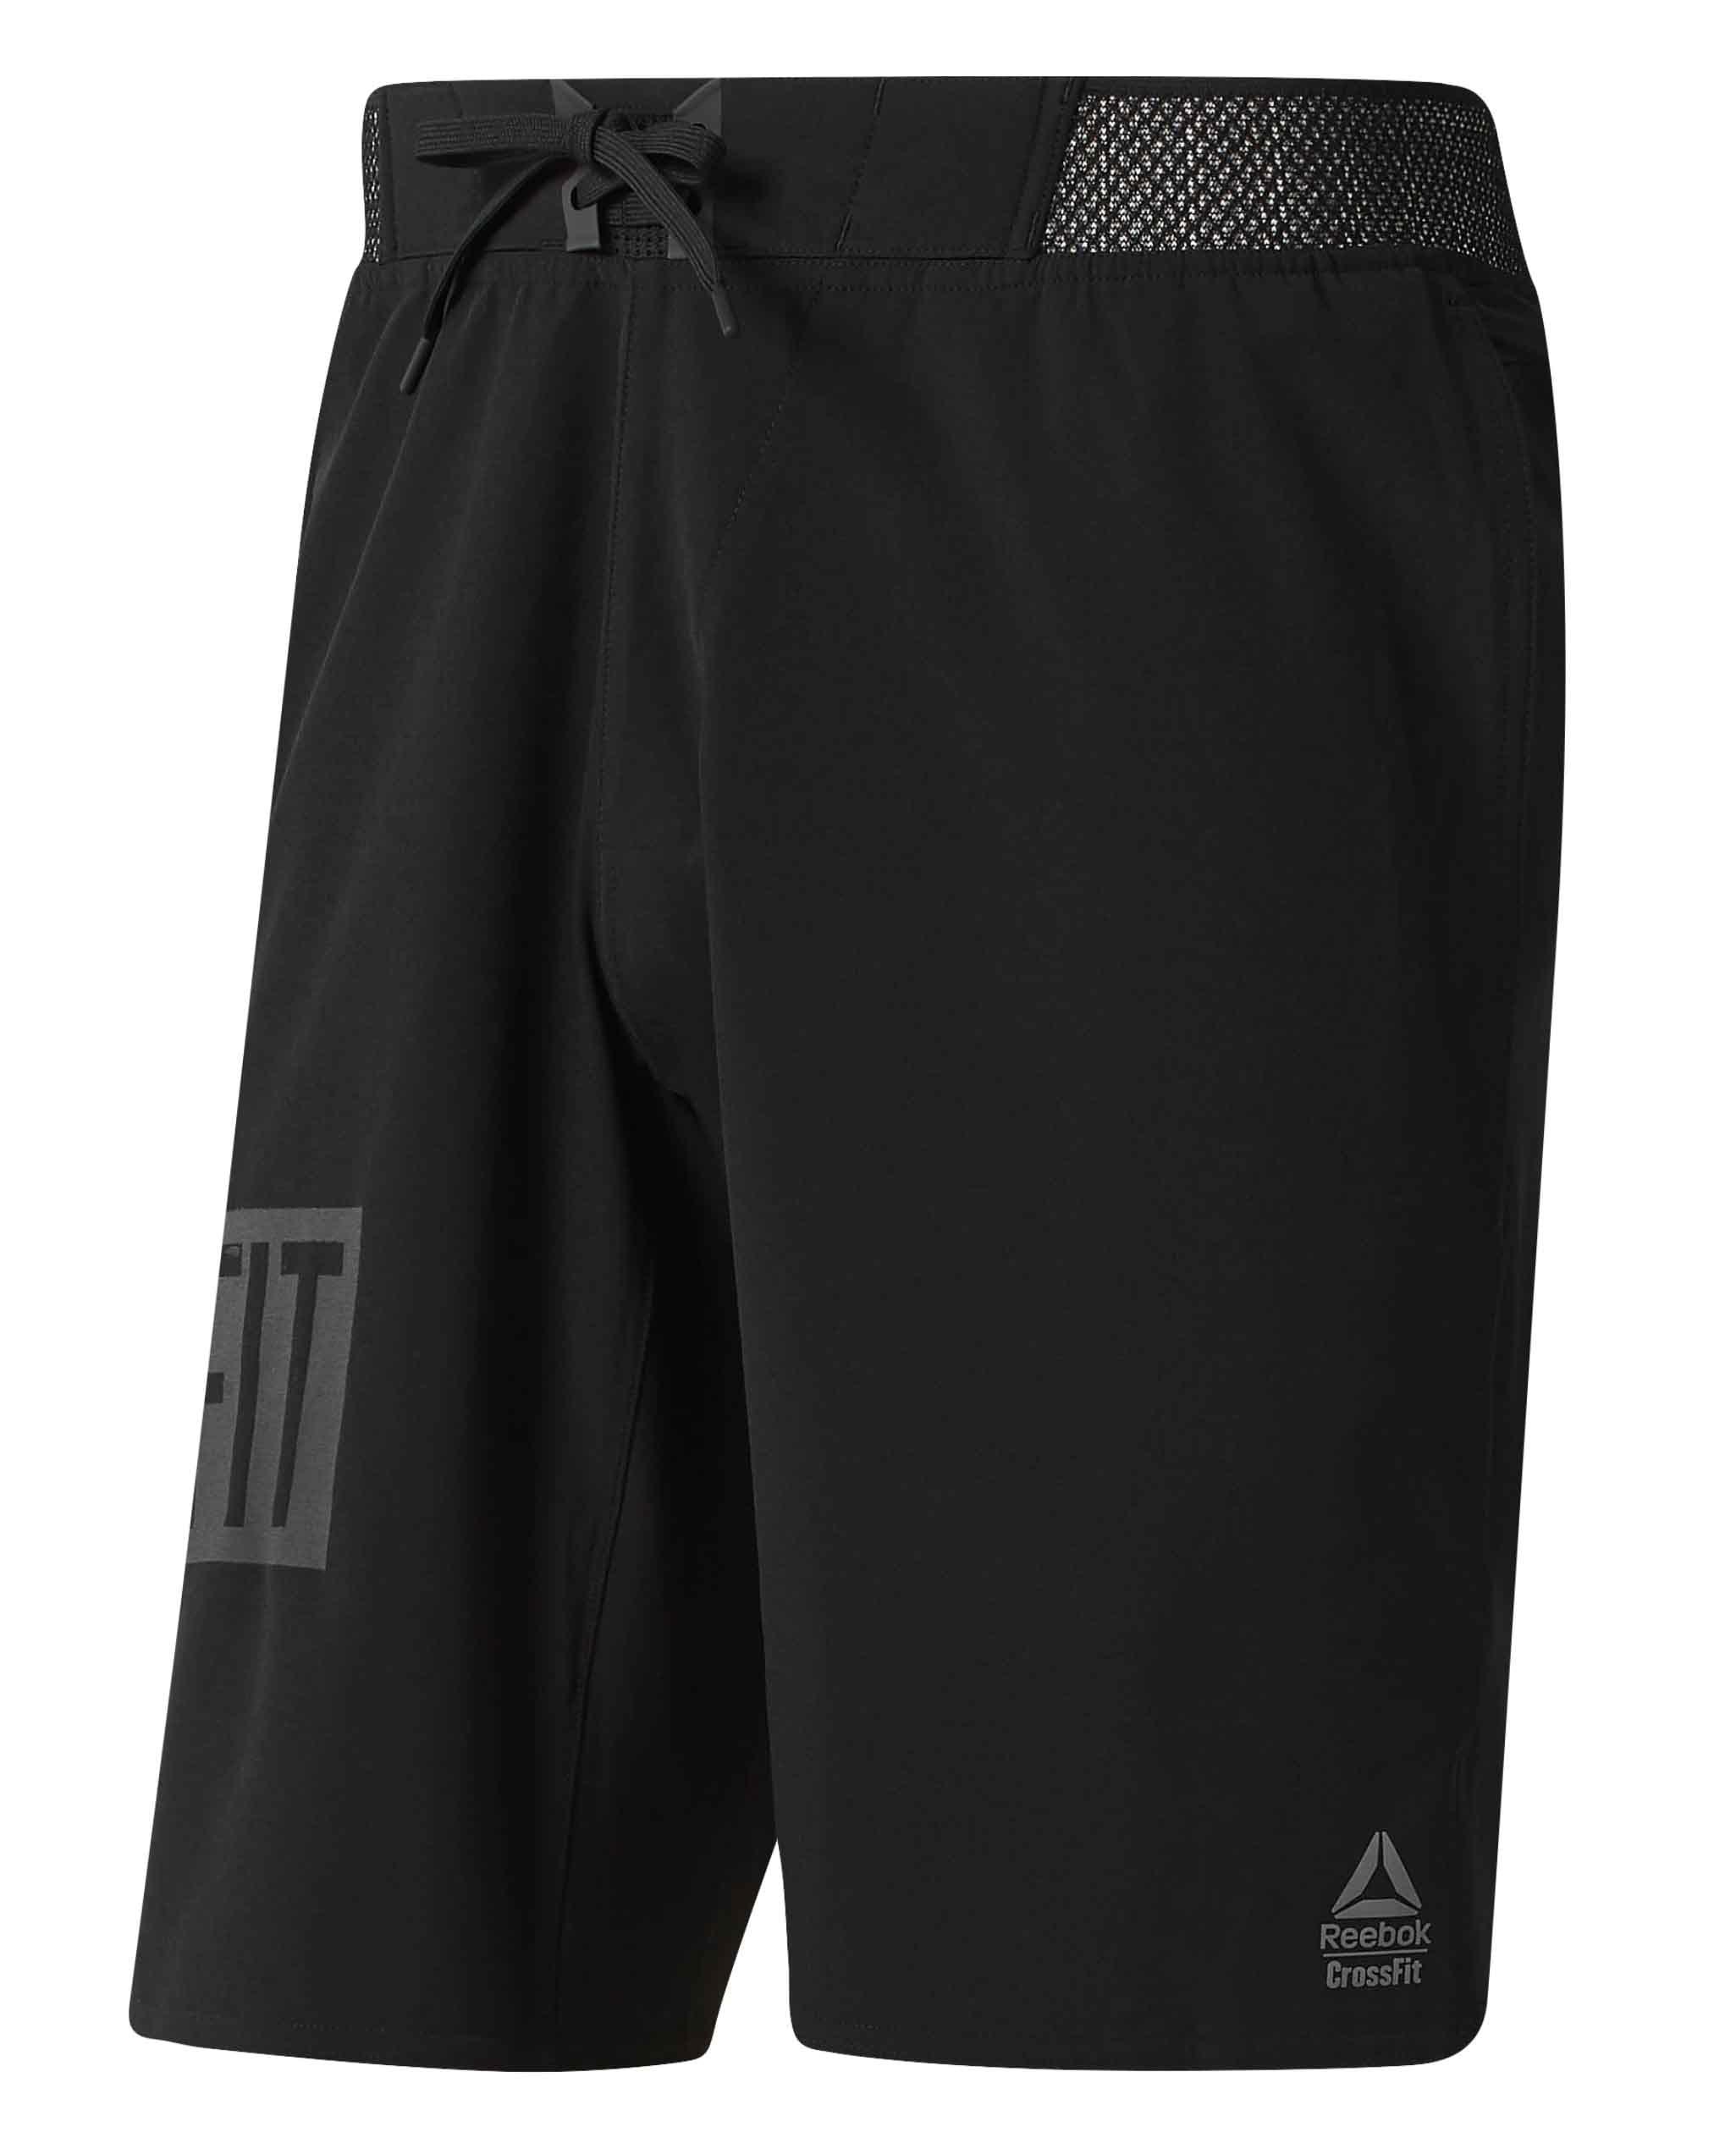 crossfit-shorts-epic